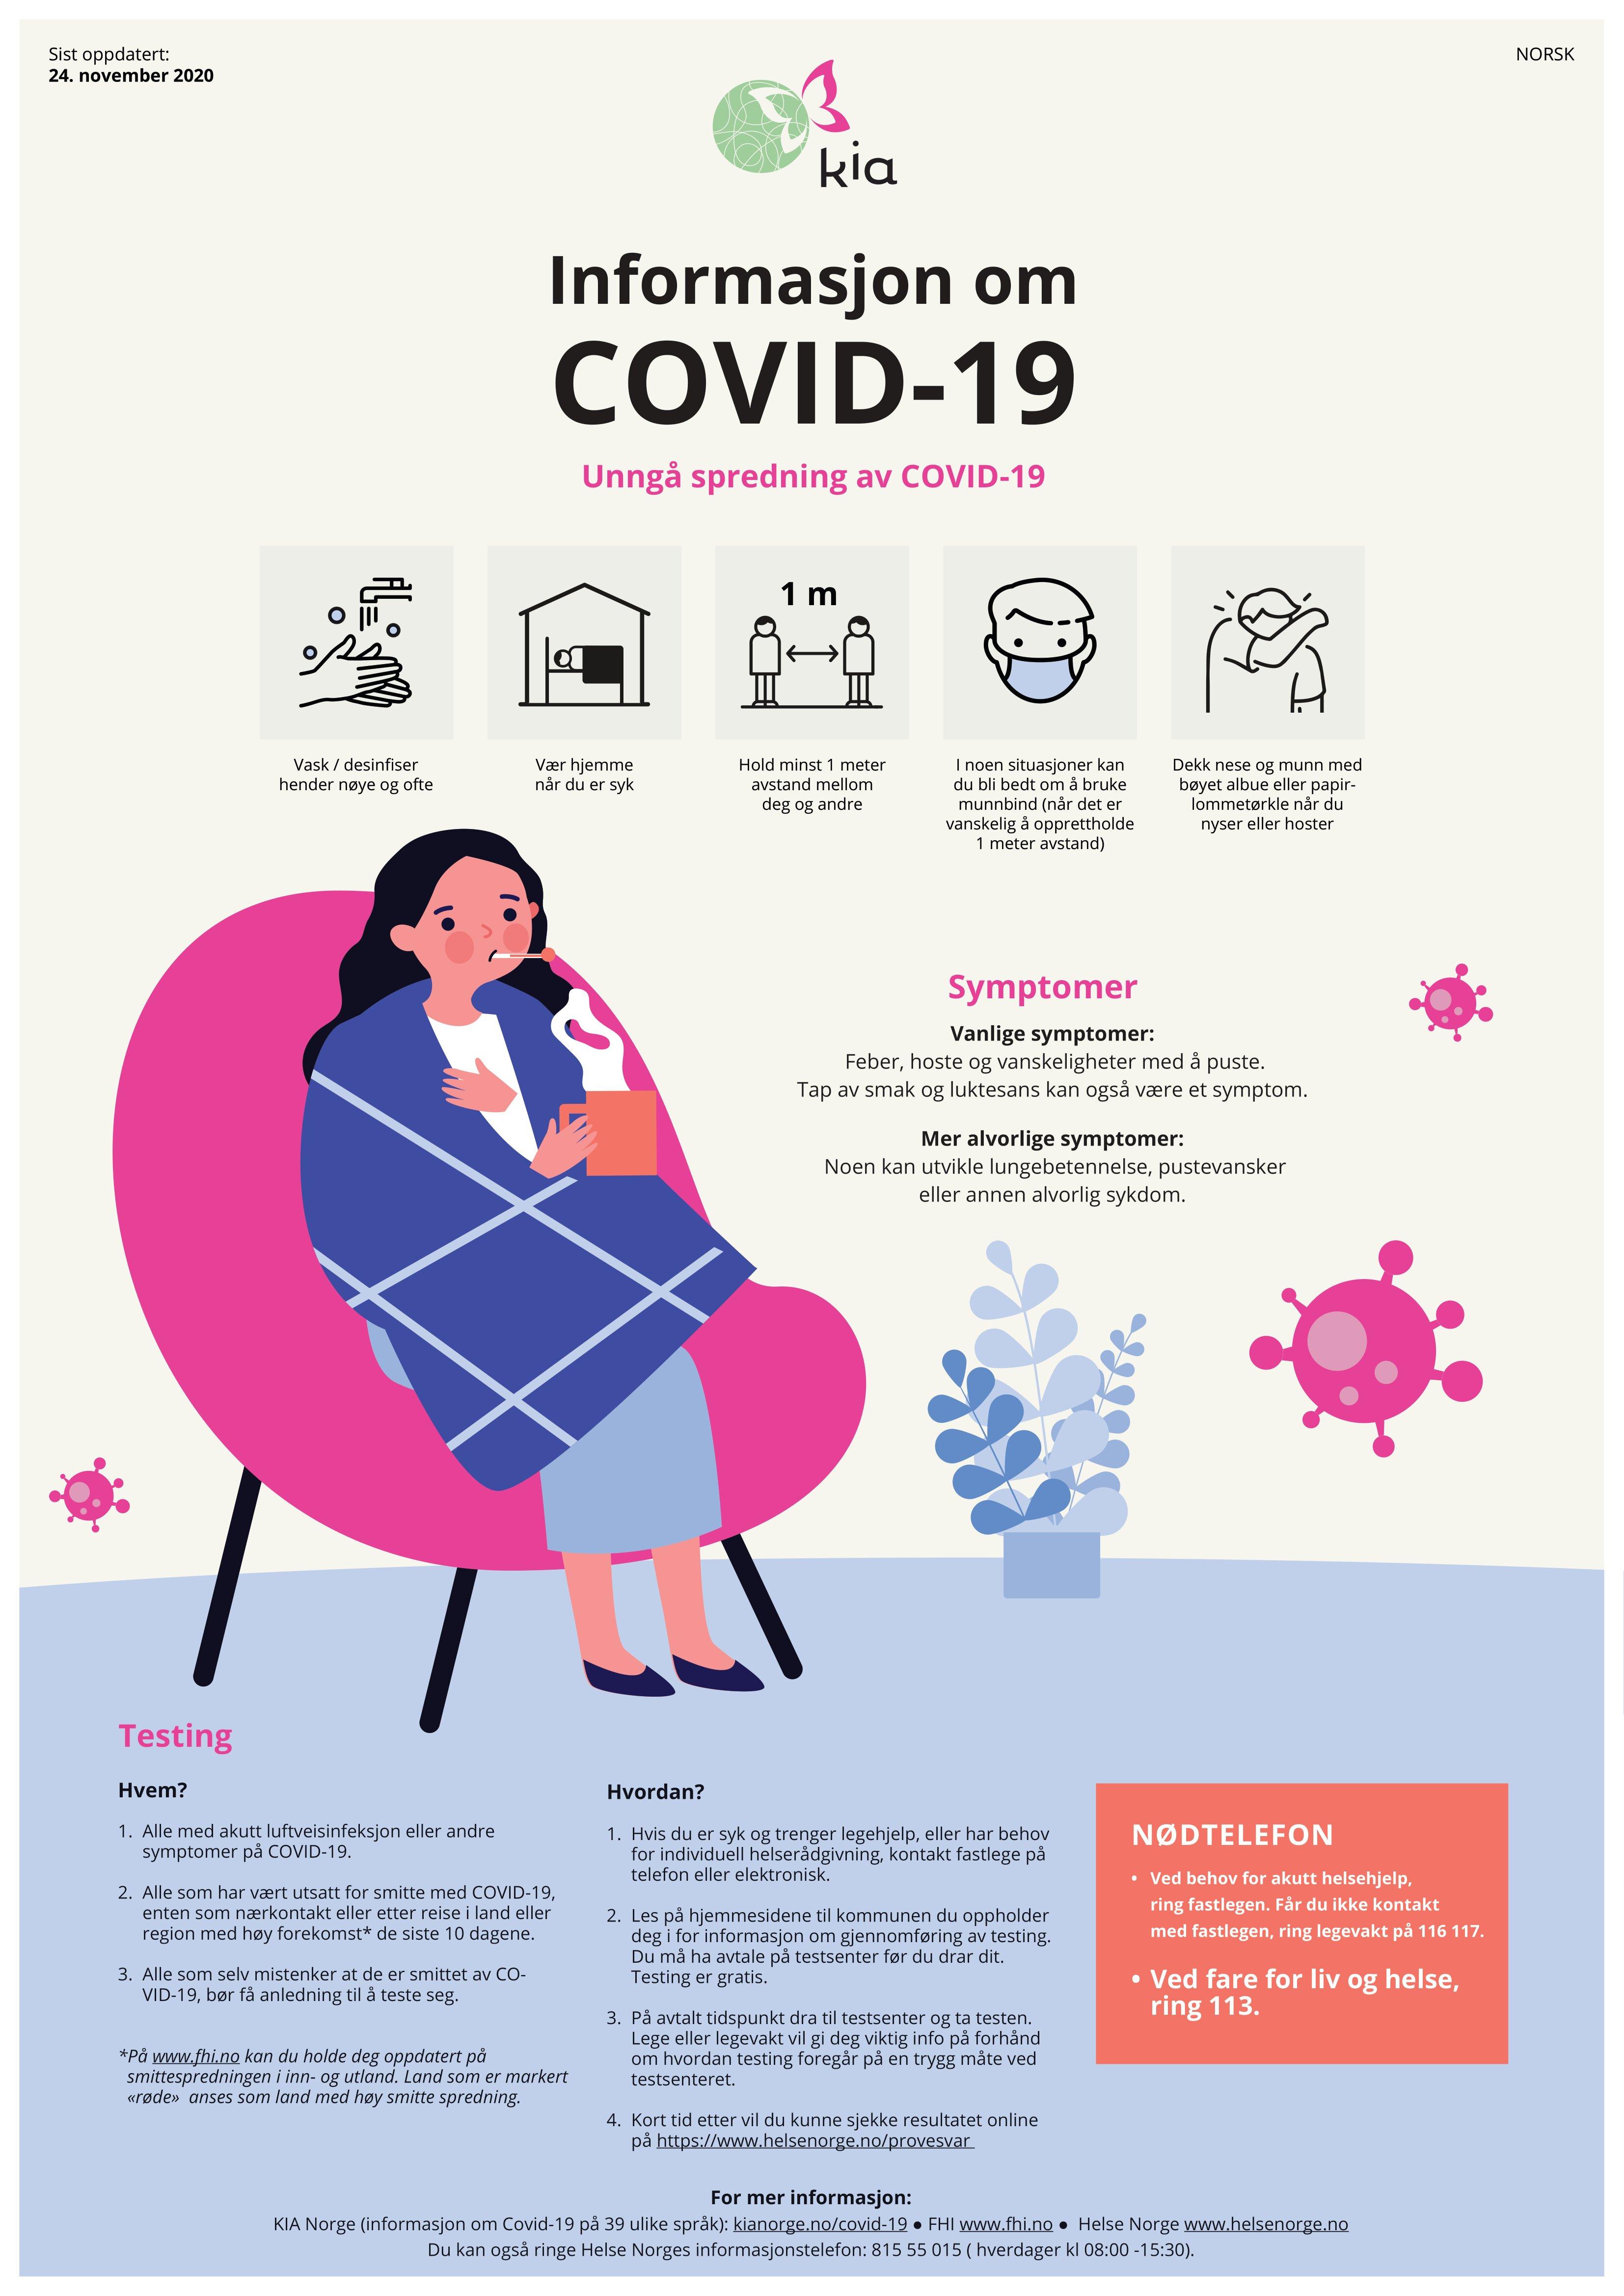 Covid 19 plakat - Covid 19 poster